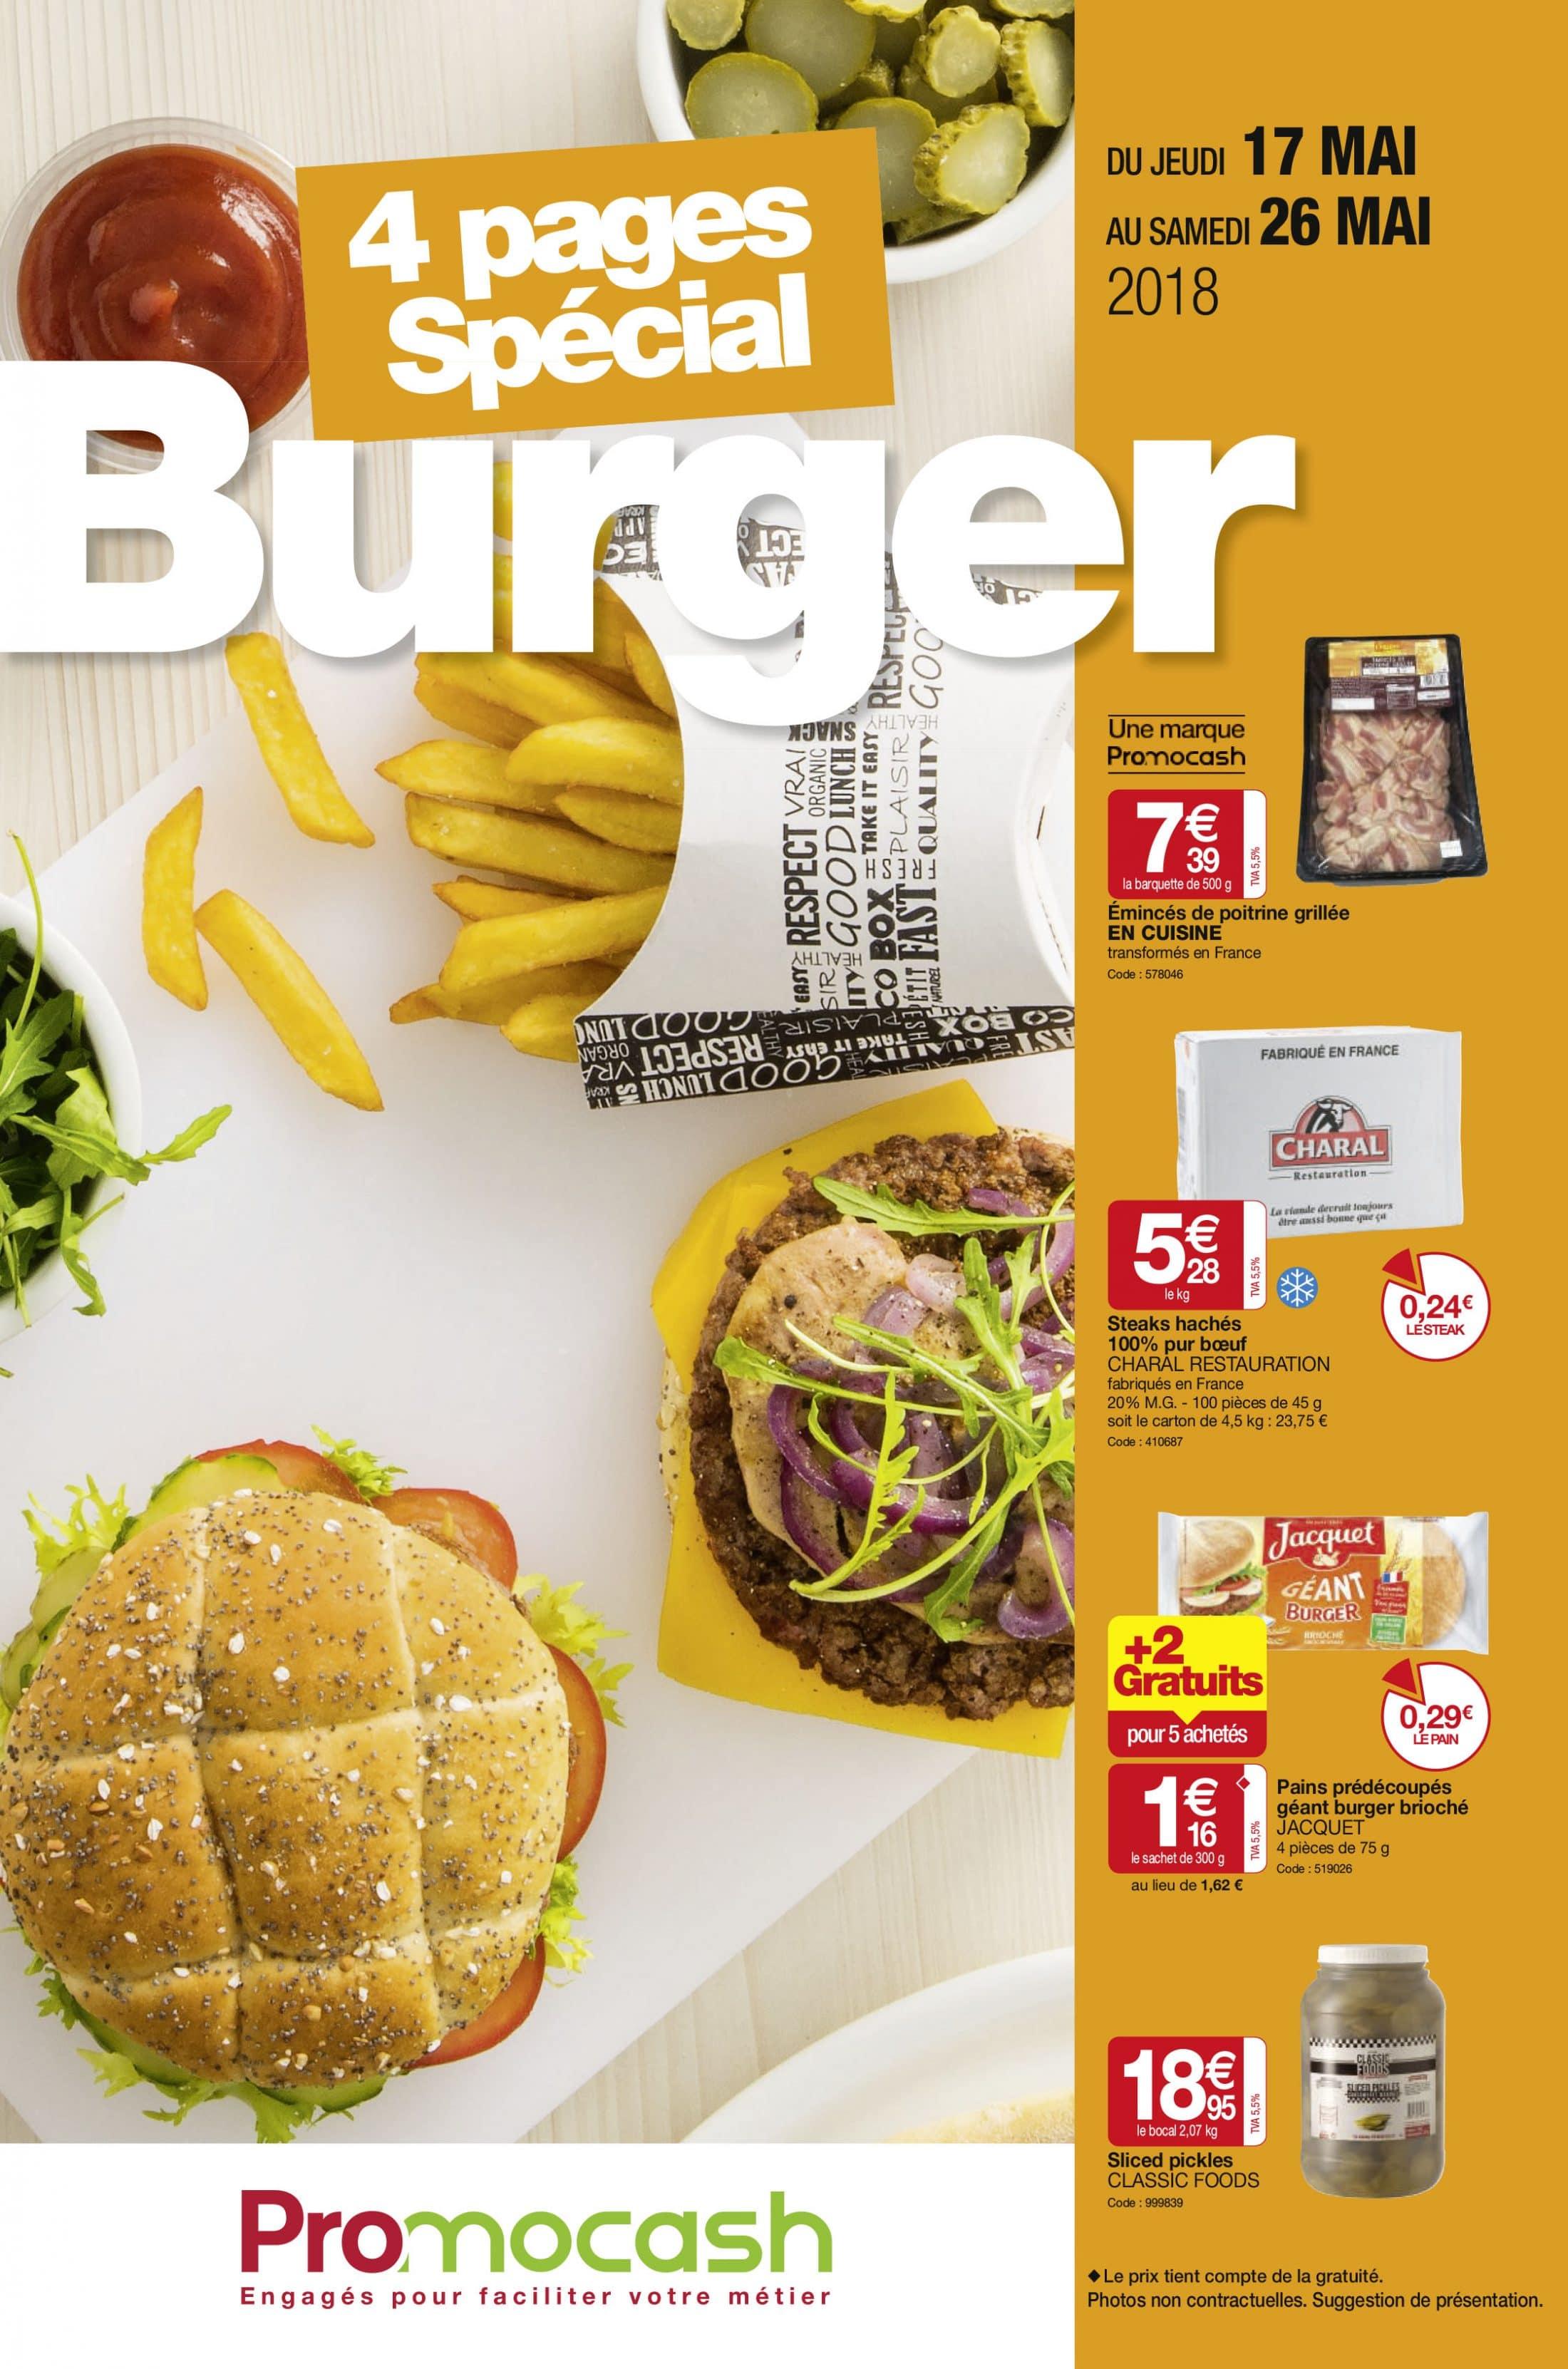 Spécial burger du 17 au 26 mai 2018